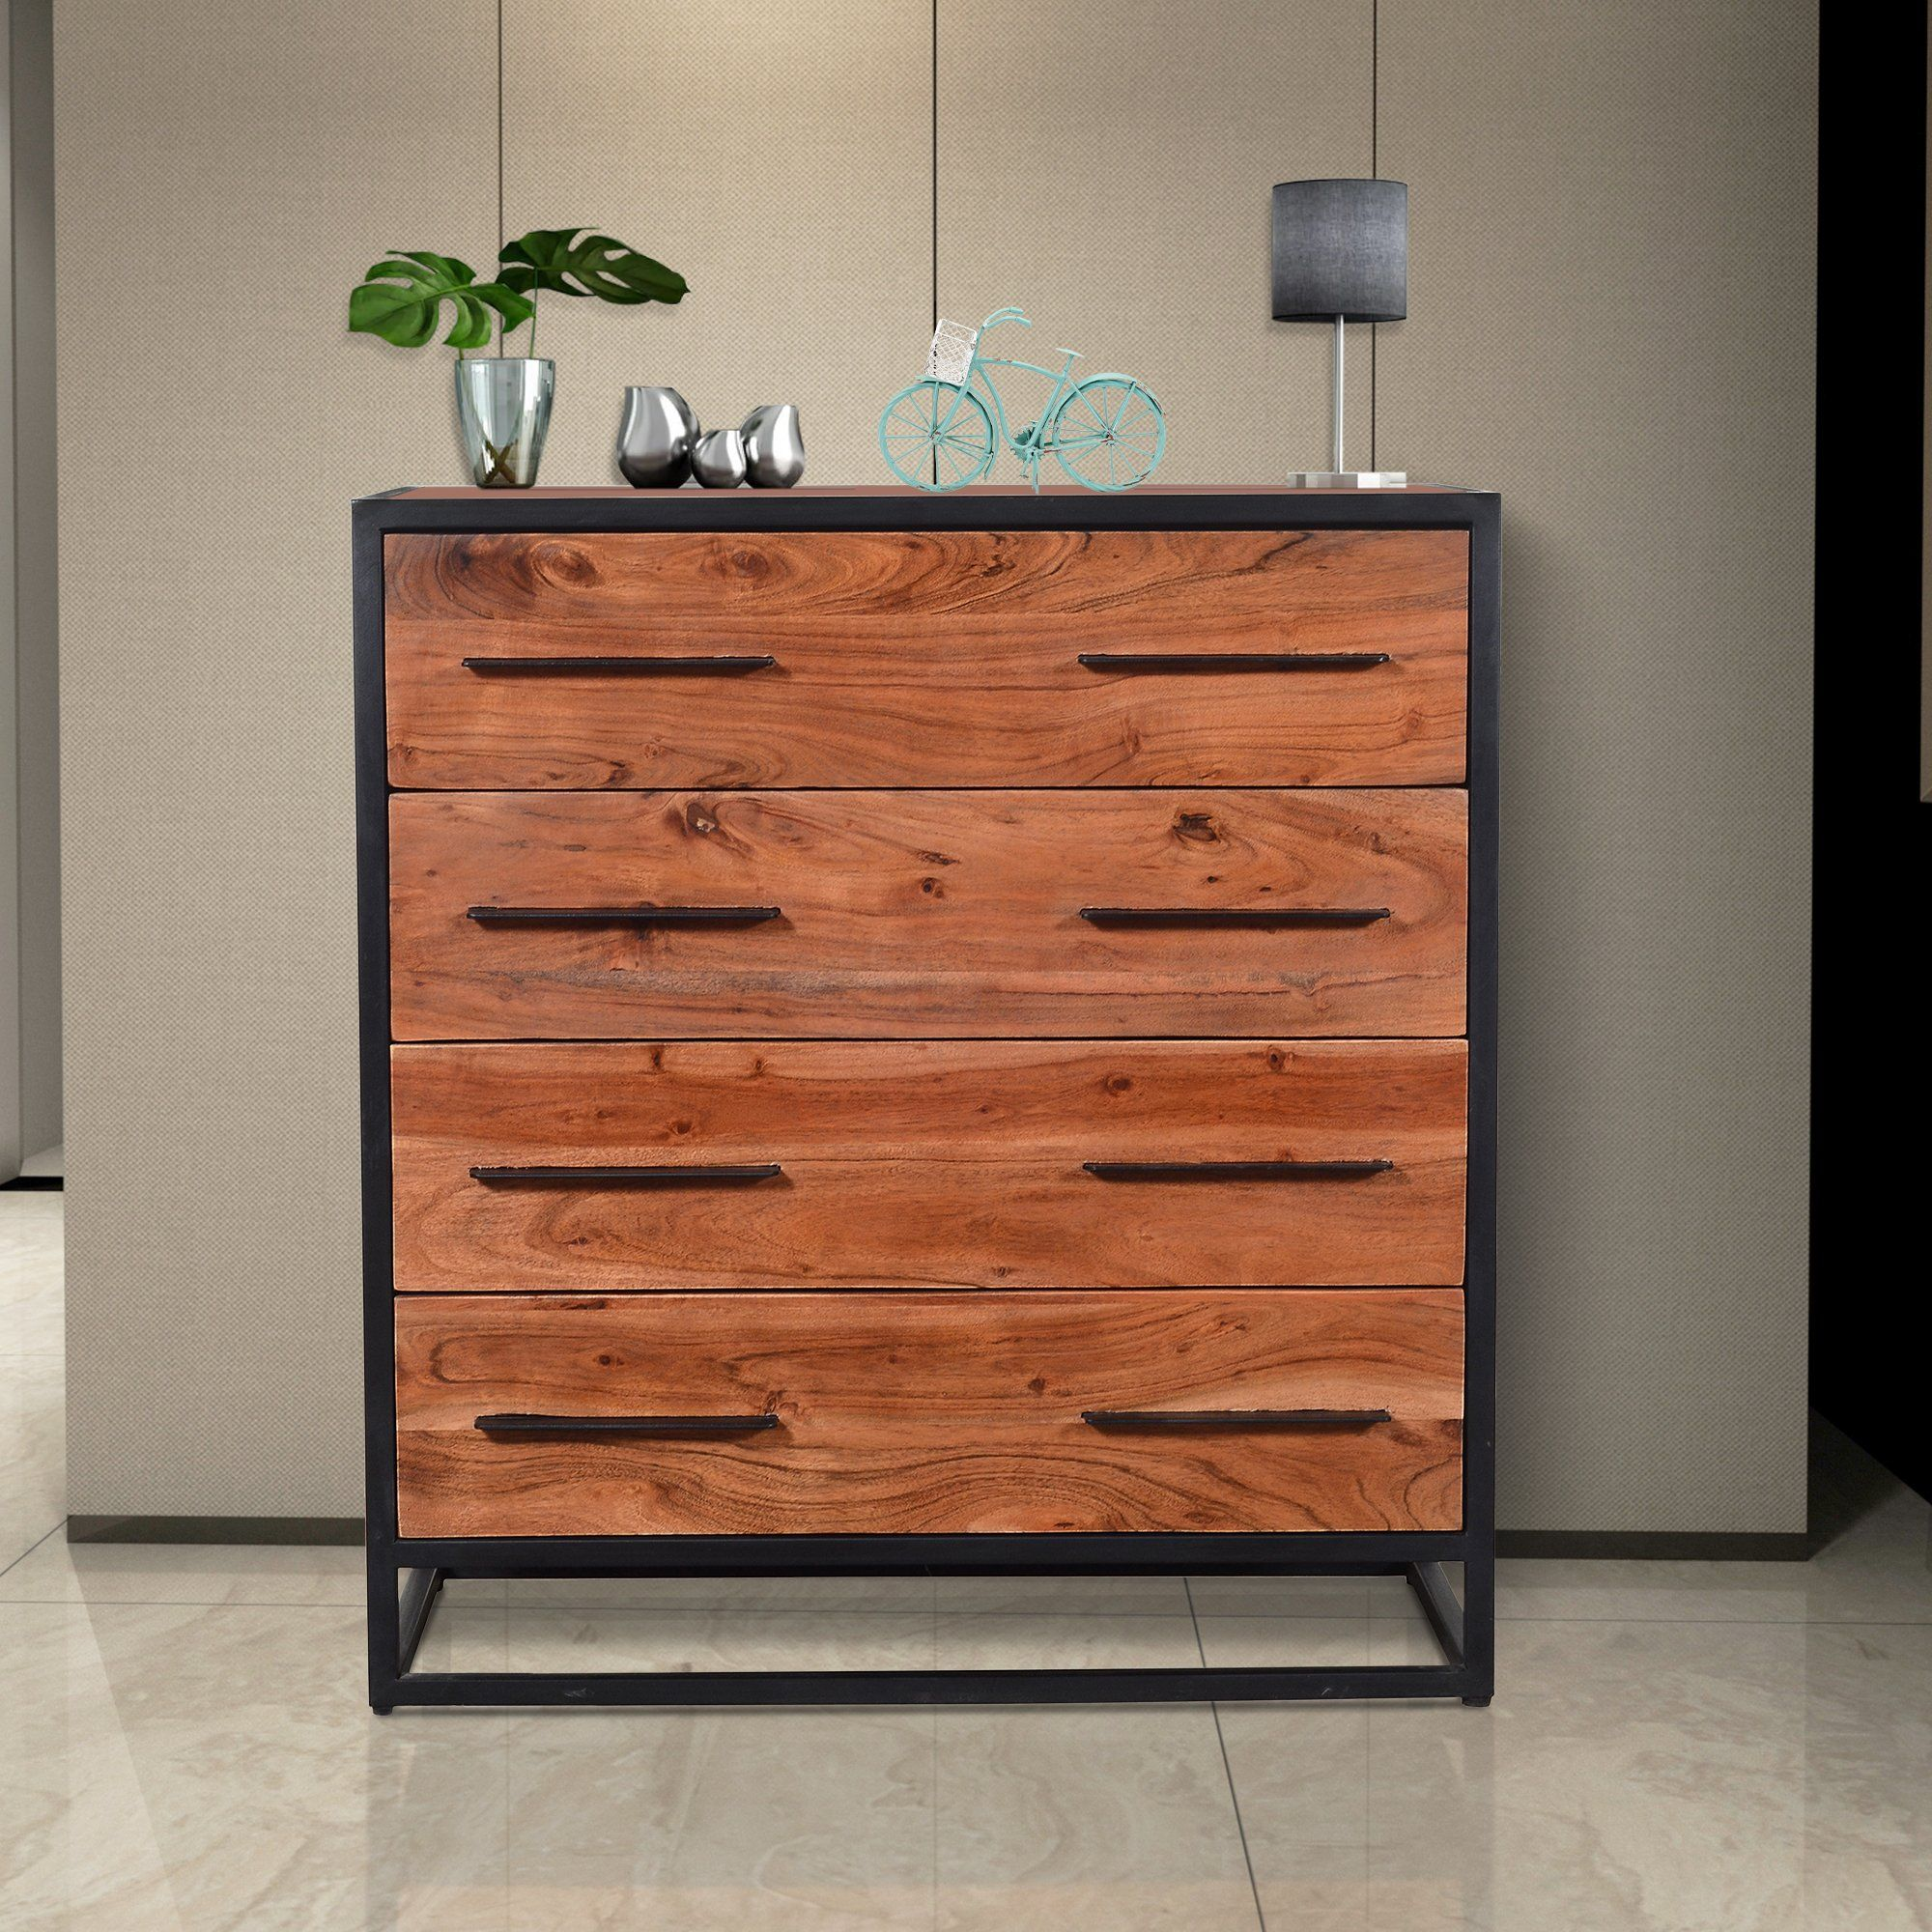 Handmade Dresser With Live Edge Design 4 Drawers Brown And Black Upt 197872 Handmade Dressers Rustic Dresser Live Edge Design [ 2000 x 2000 Pixel ]